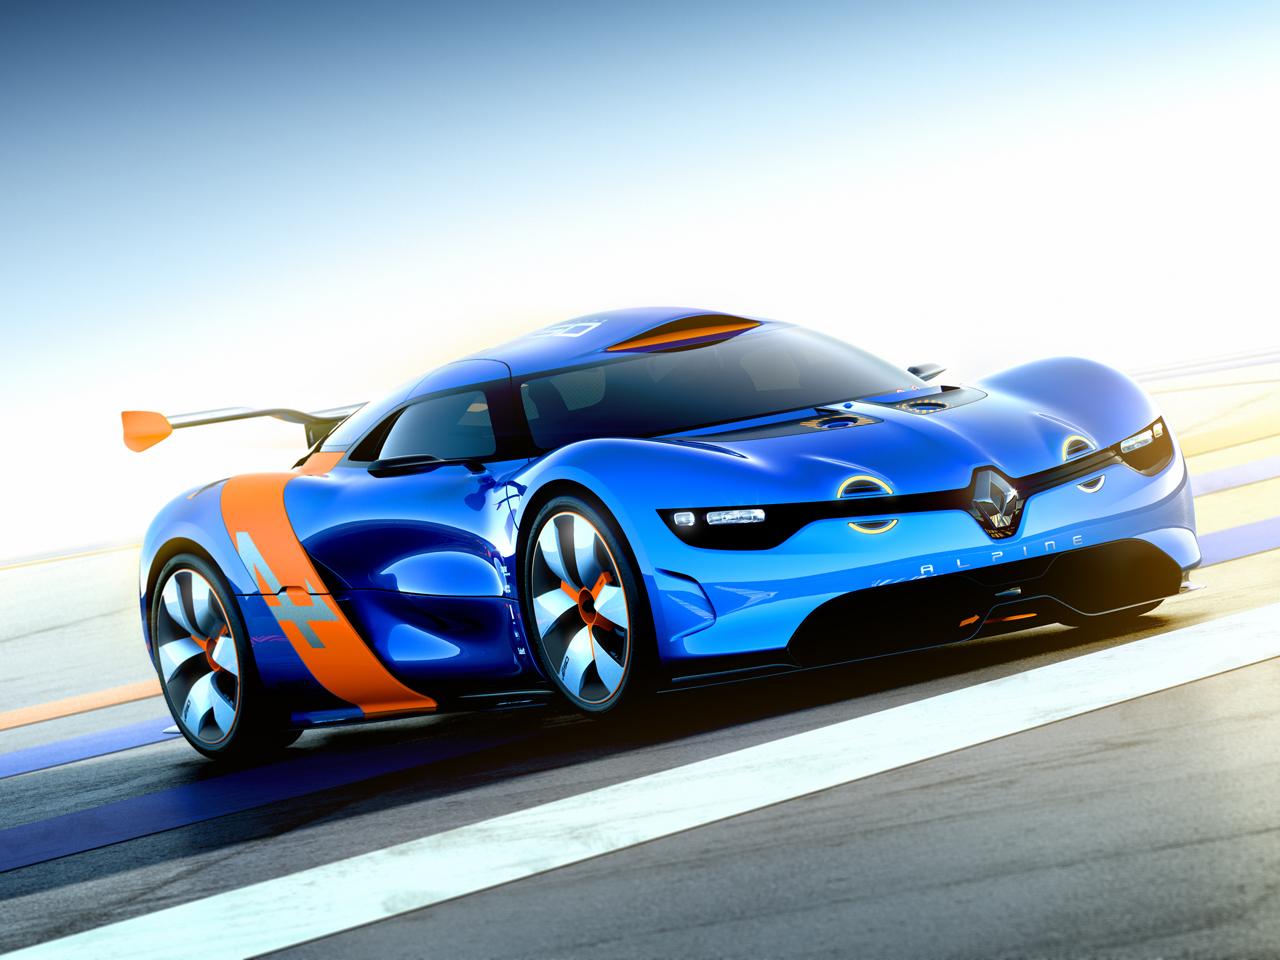 sports cars 2015 renault alpine a110 50 supercar. Black Bedroom Furniture Sets. Home Design Ideas